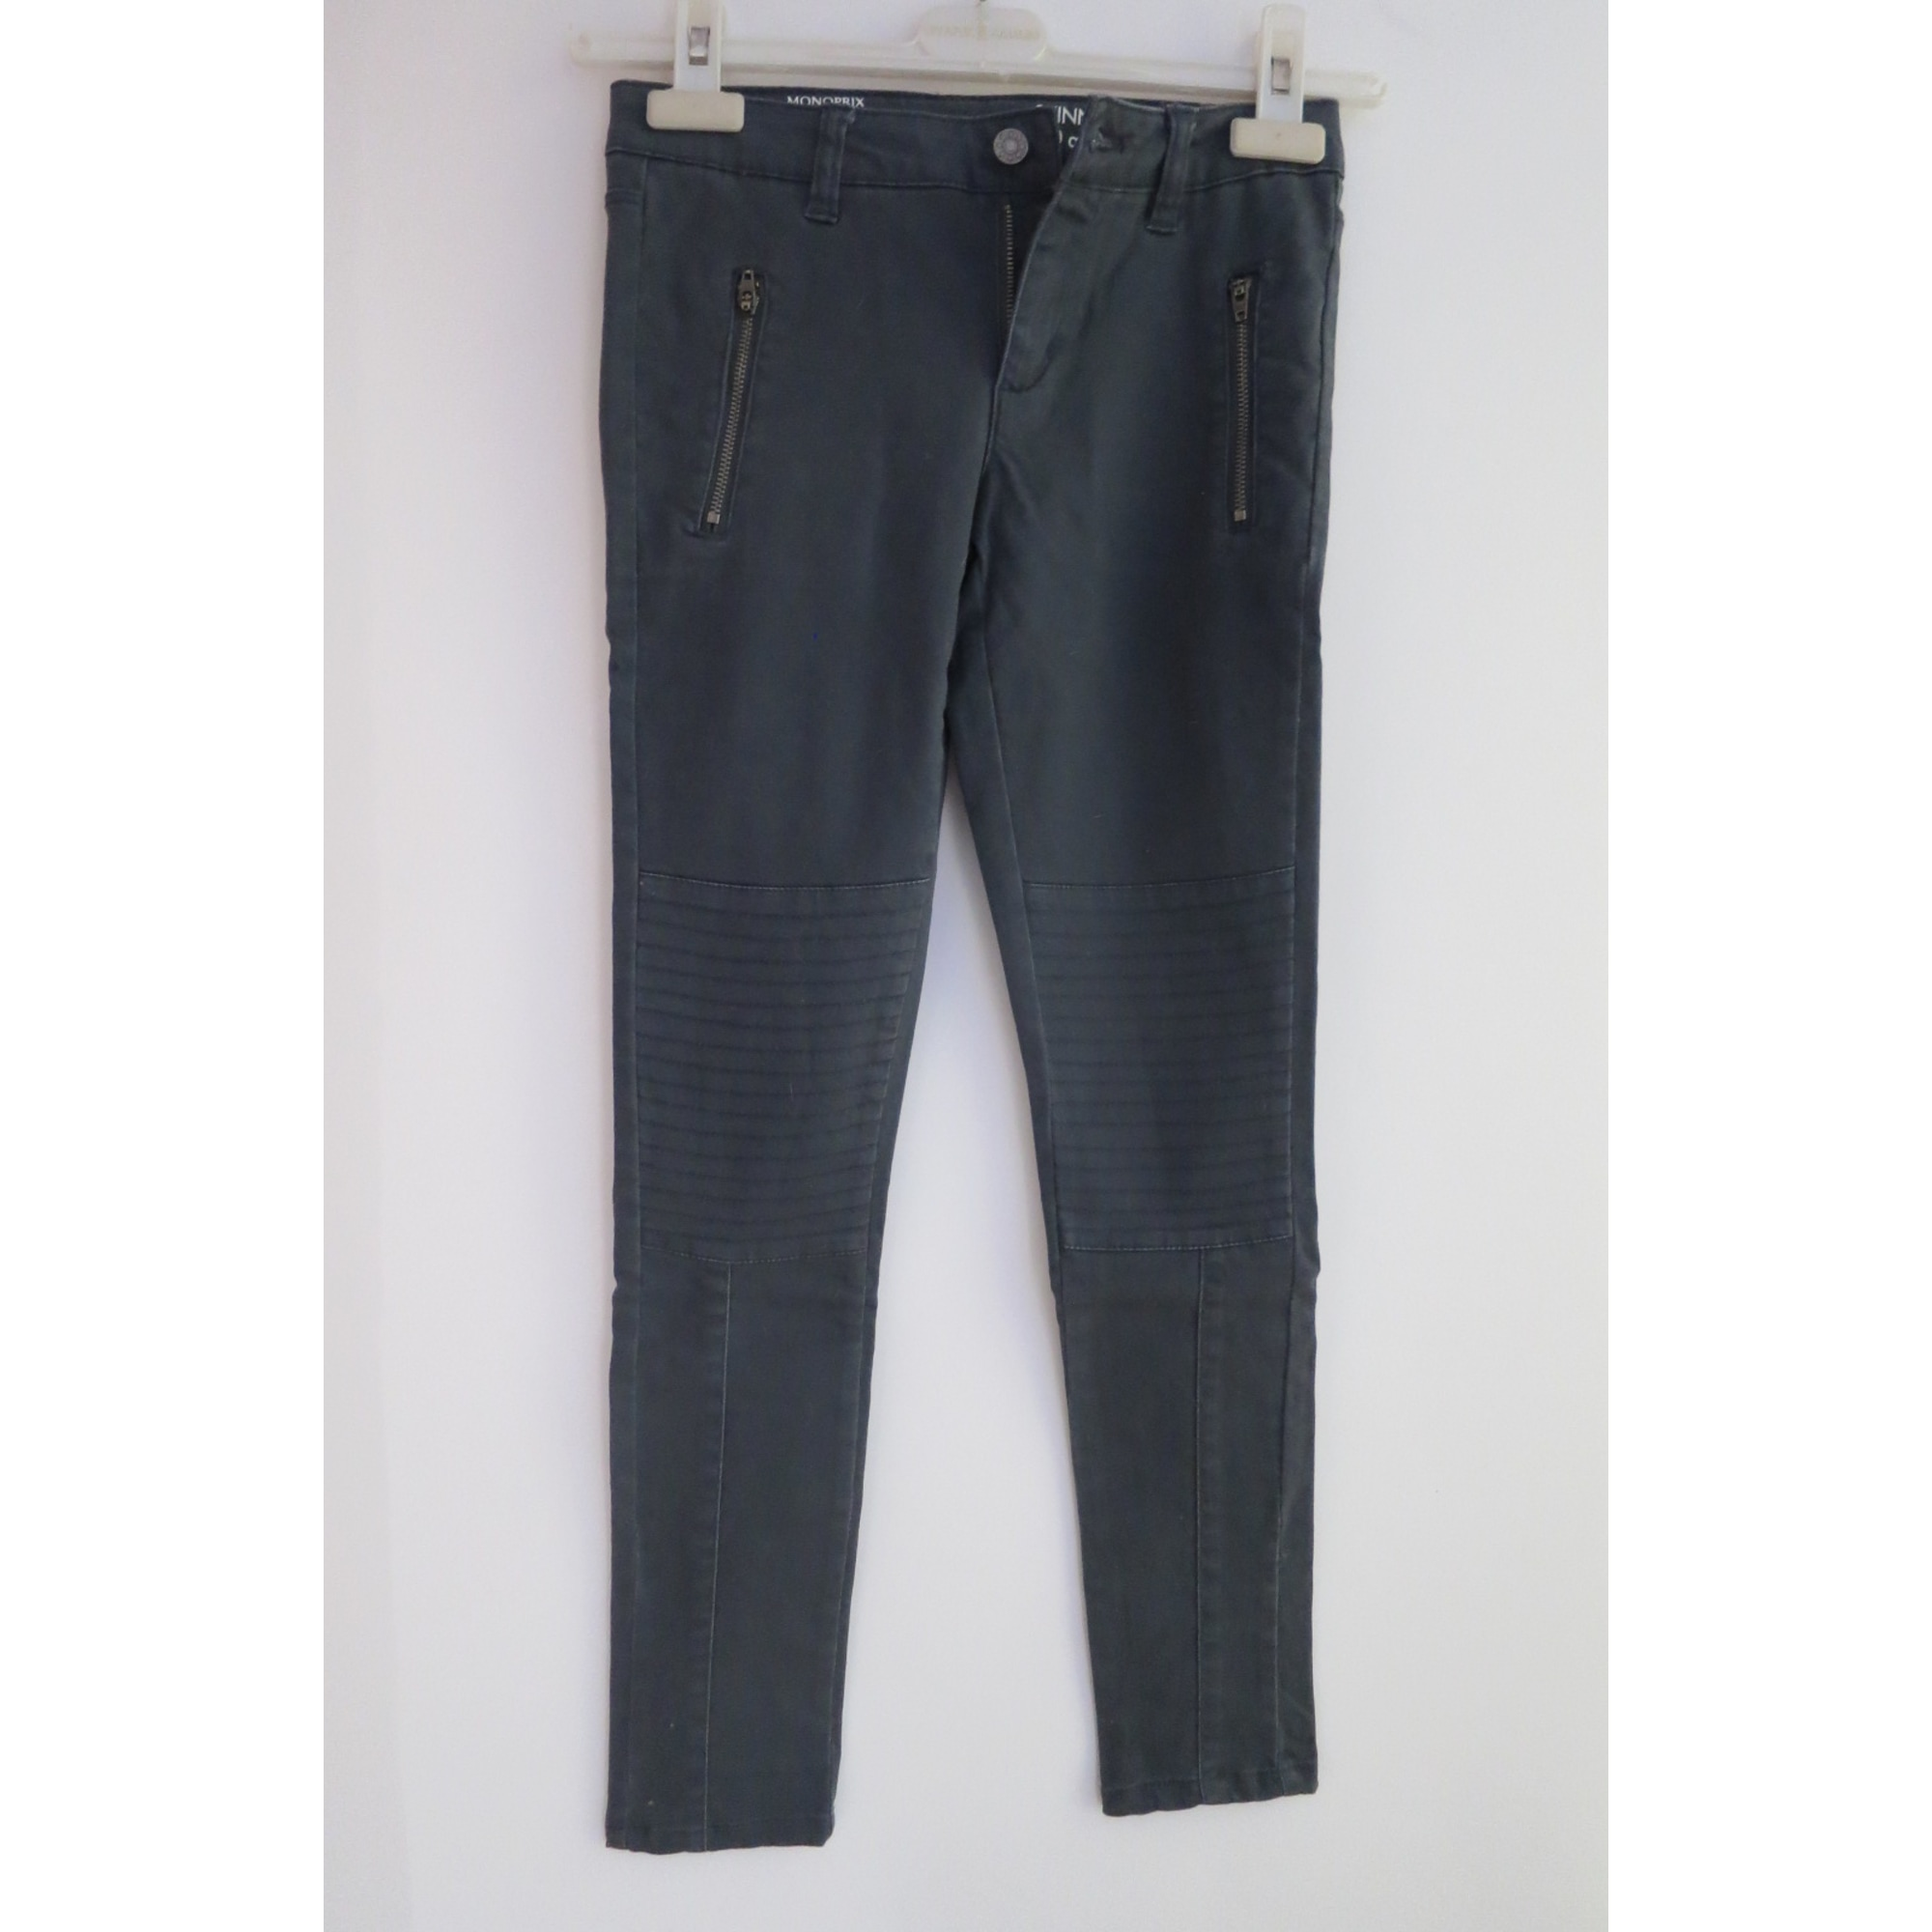 Pantalon MONOPRIX Gris, anthracite